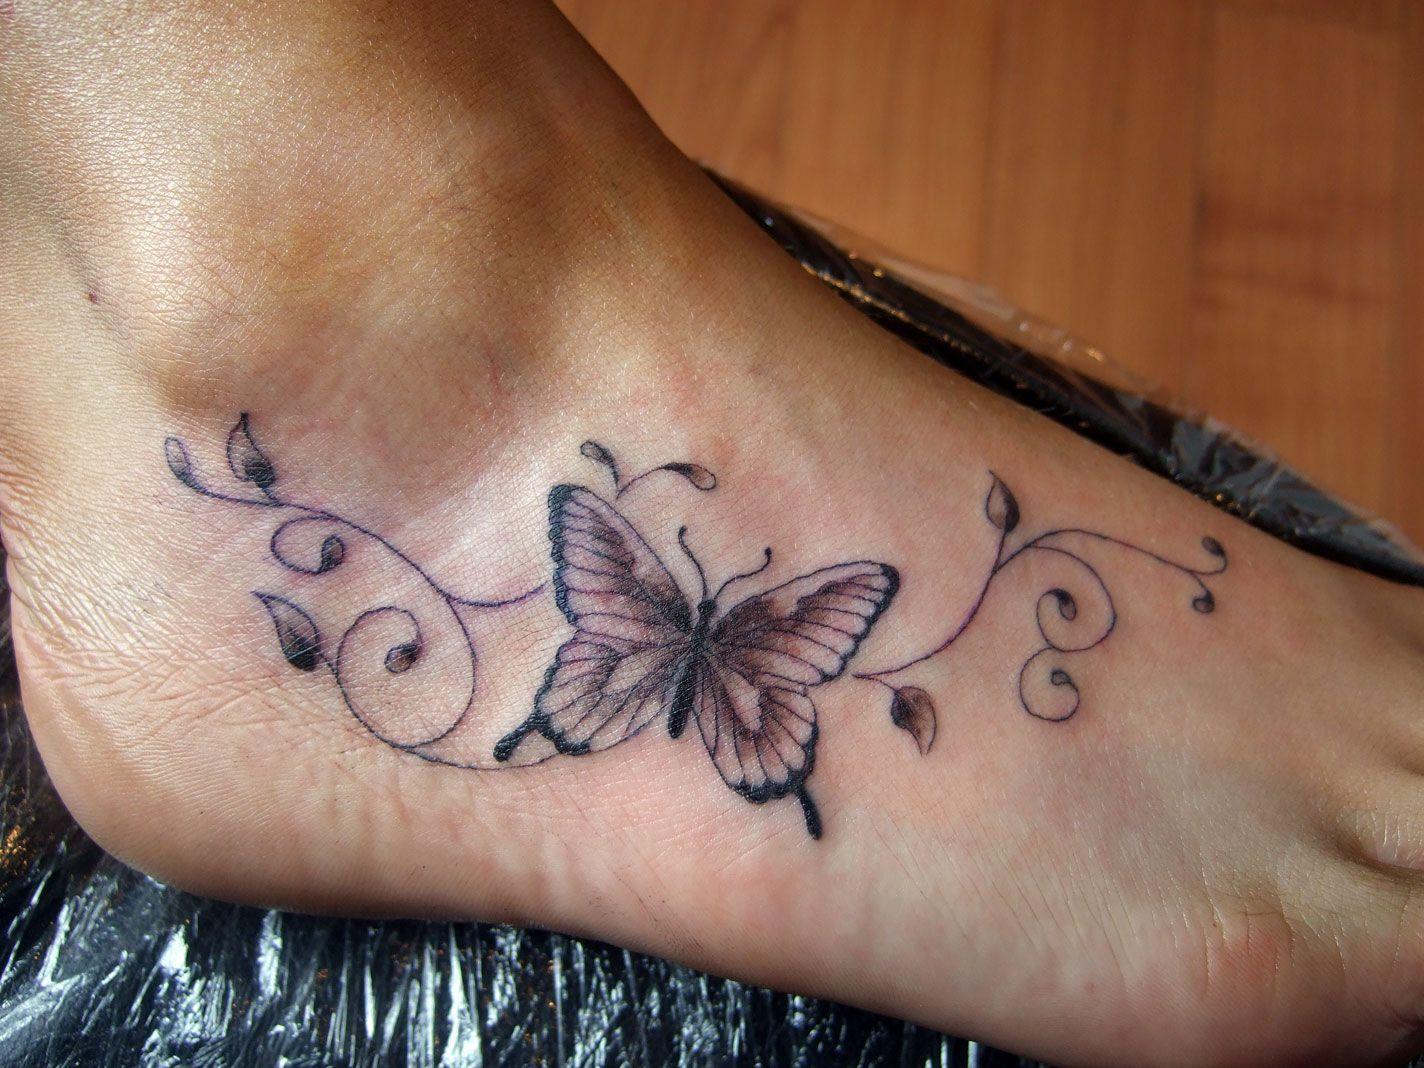 Butterfly Tattoos Designs On Foot Jpg 1424 1068 Butterfly Ankle Tattoos Butterfly Tattoos For Women Foot Tattoos